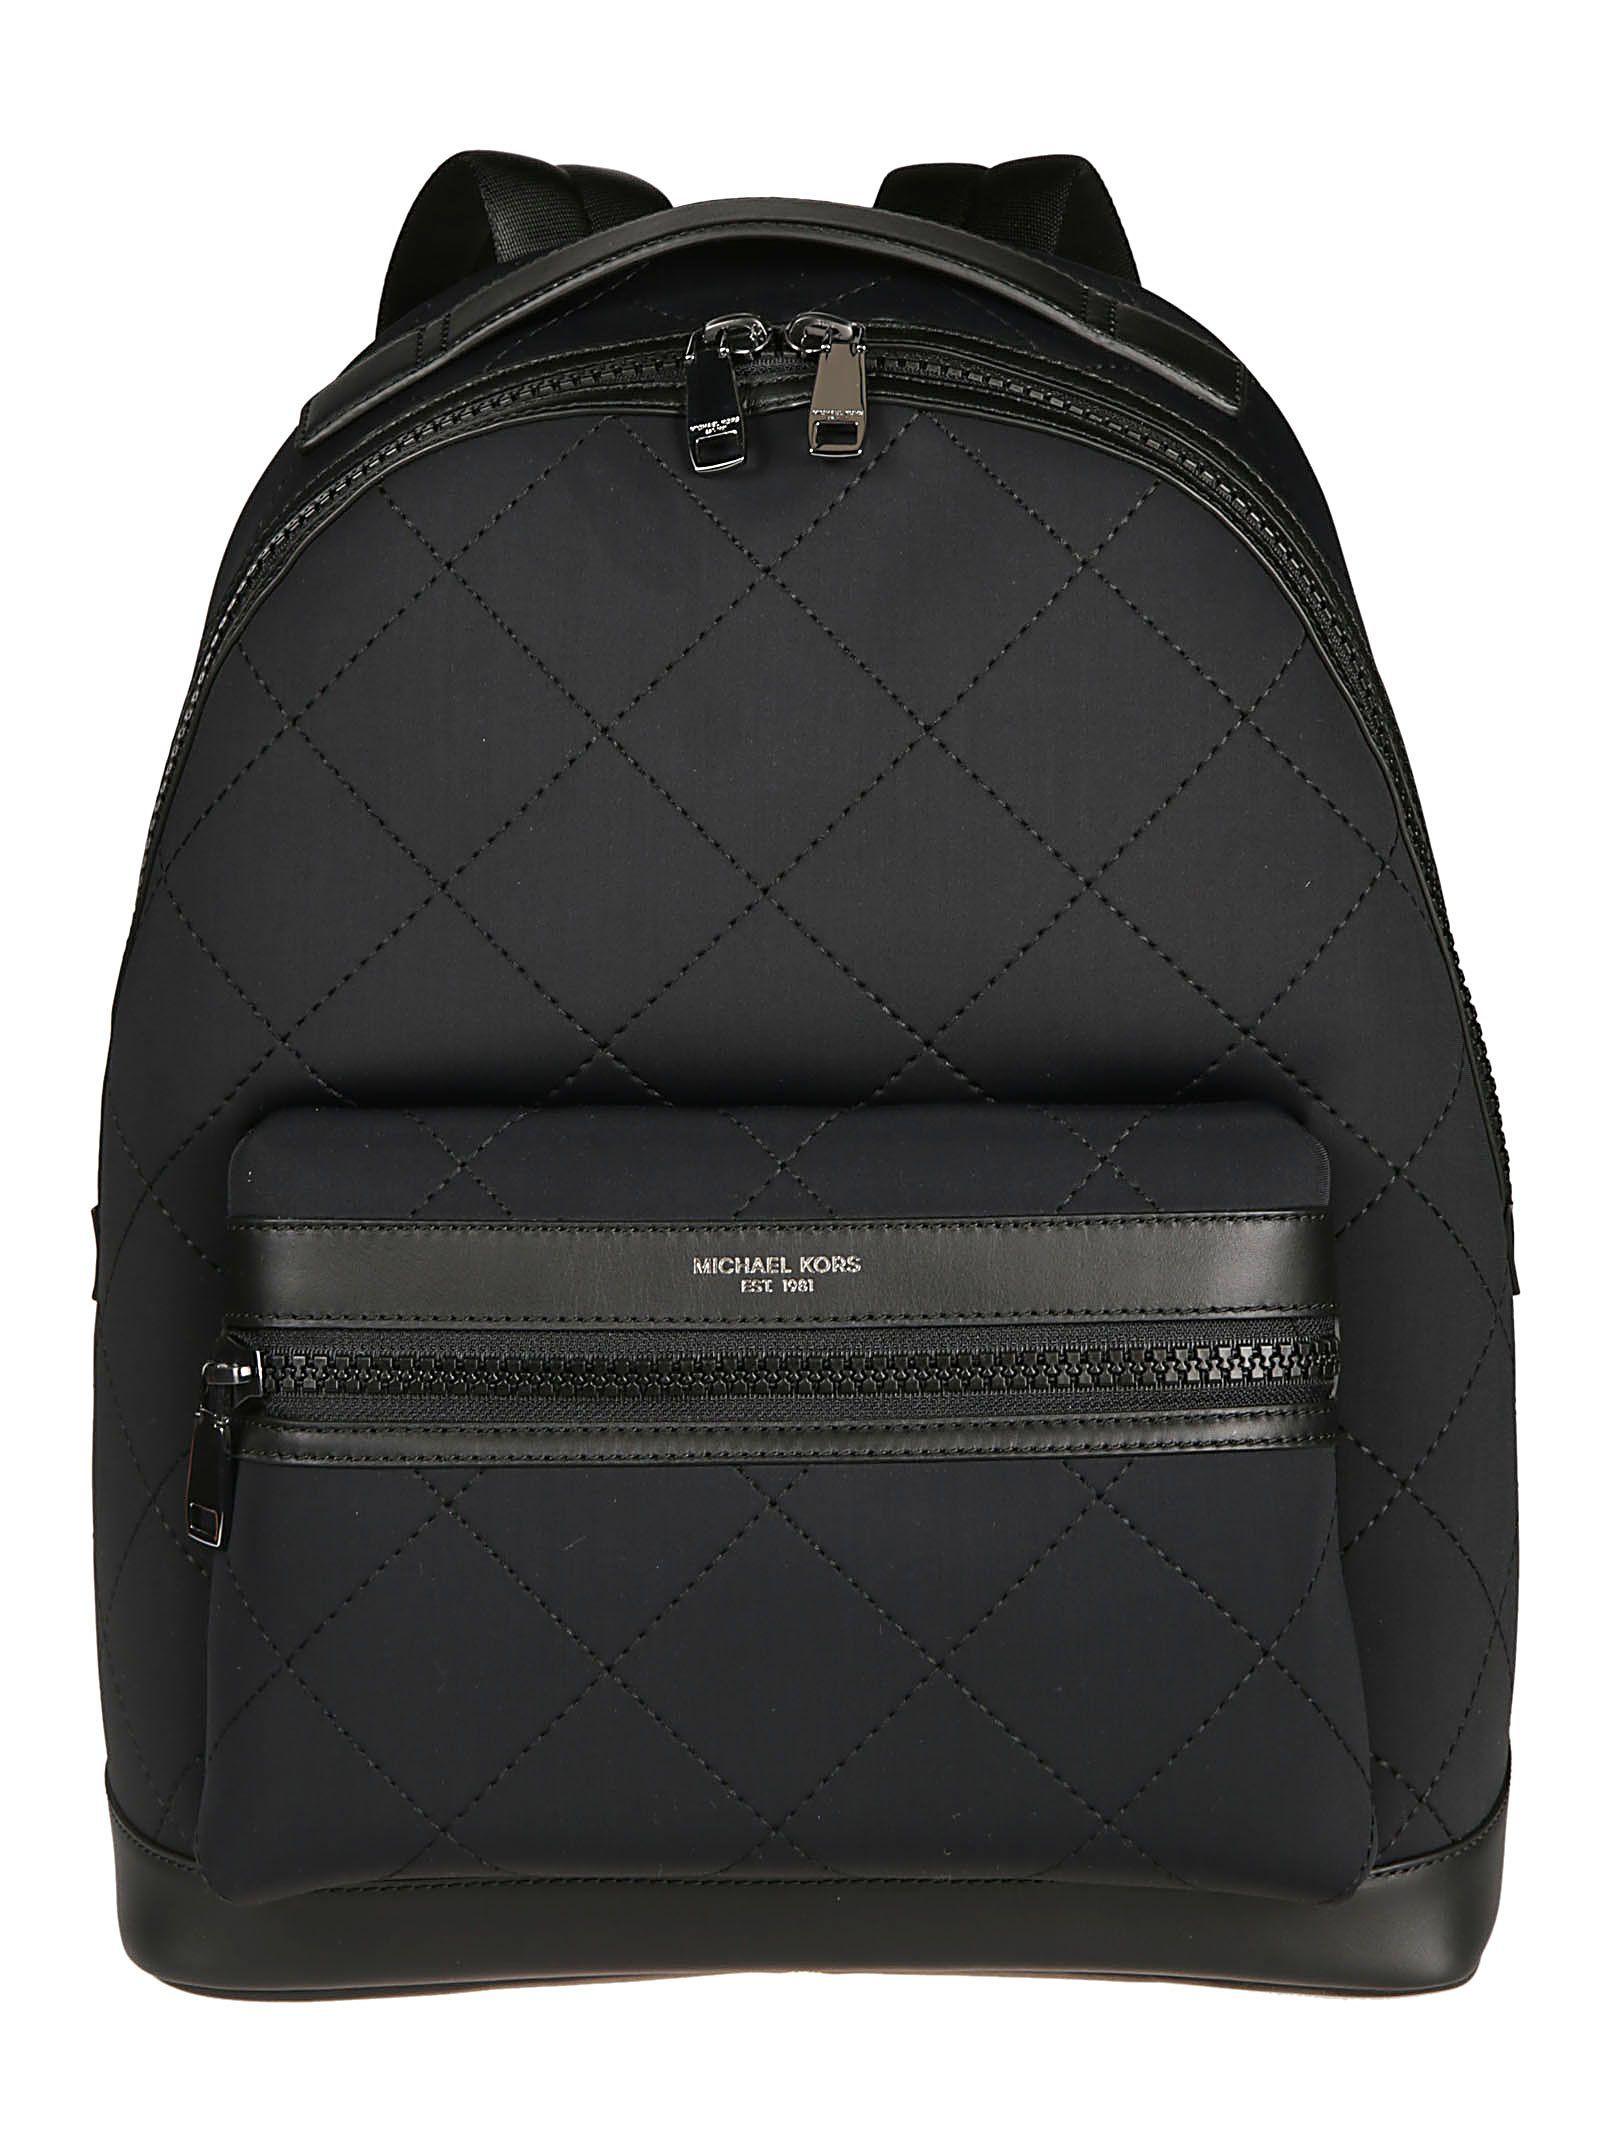 1a7b48f0e25b55 MICHAEL KORS QUILTED DETAIL BACKPACK. #michaelkors #bags #nylon #backpacks